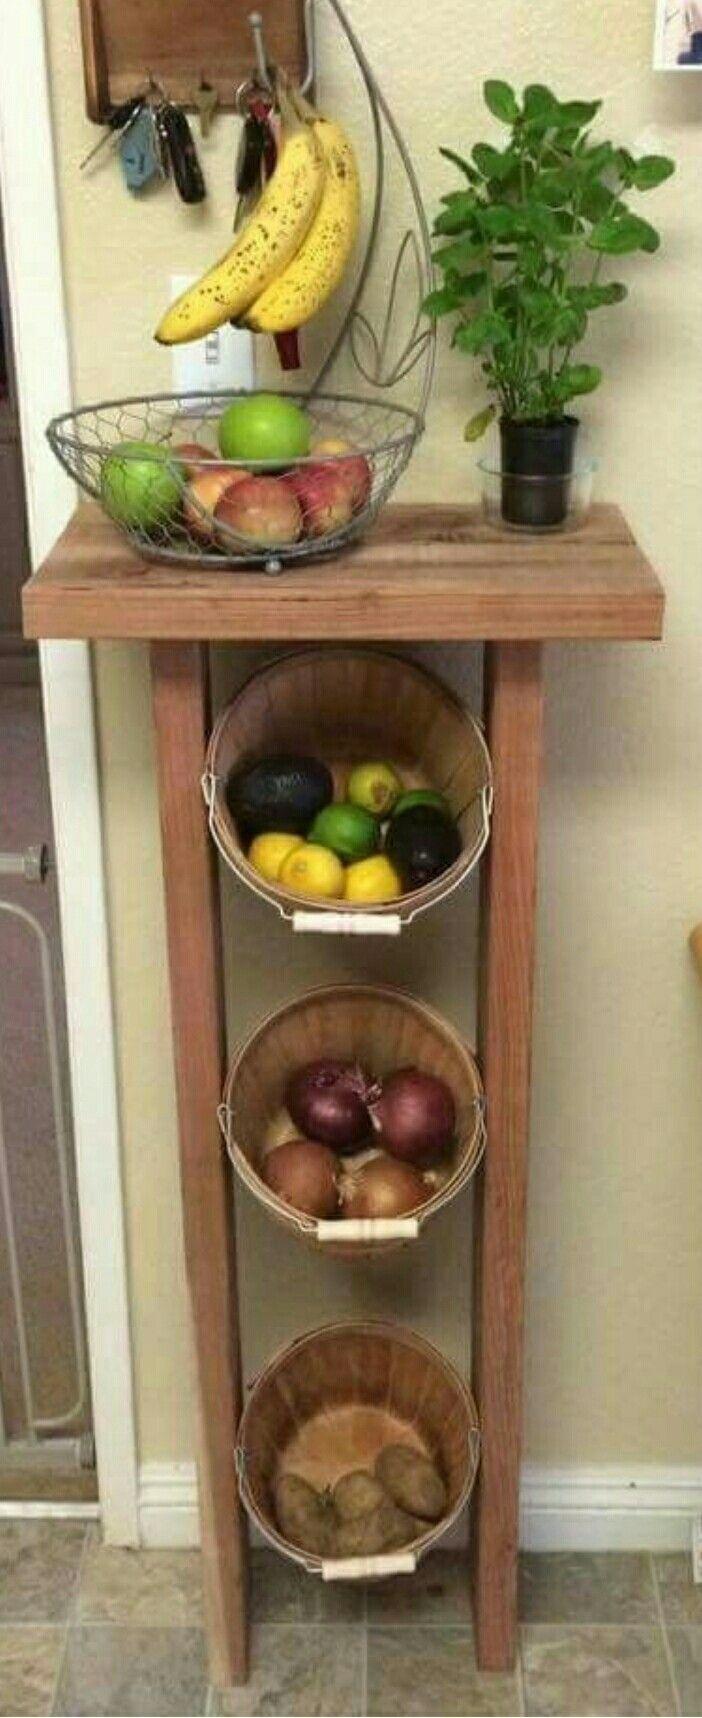 Fruteira